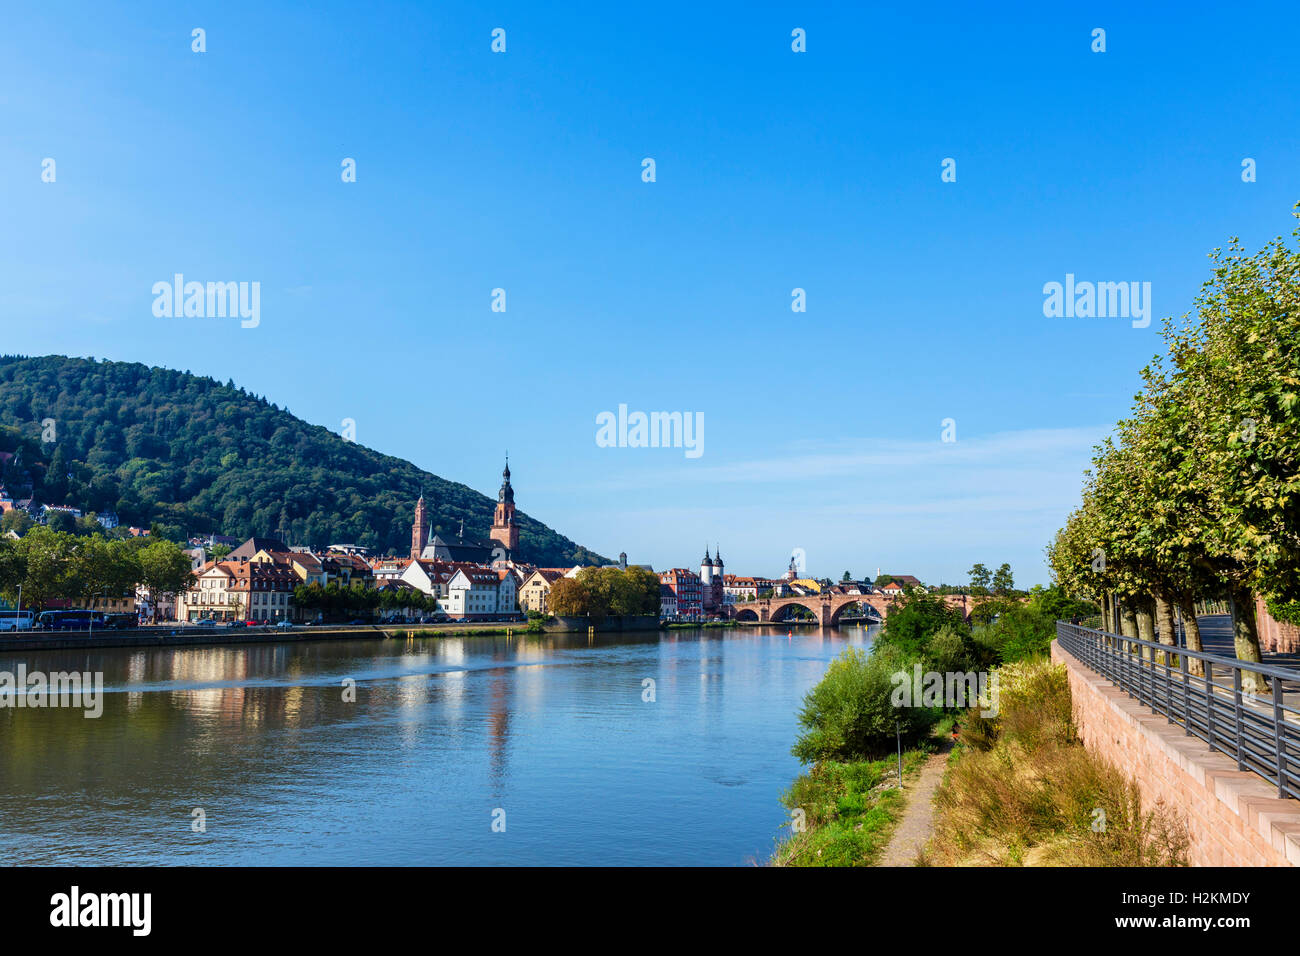 The River Necke looking towards the Altstadt and the Old Bridge, Heidelberg, Baden-Württemberg, Germany - Stock Image